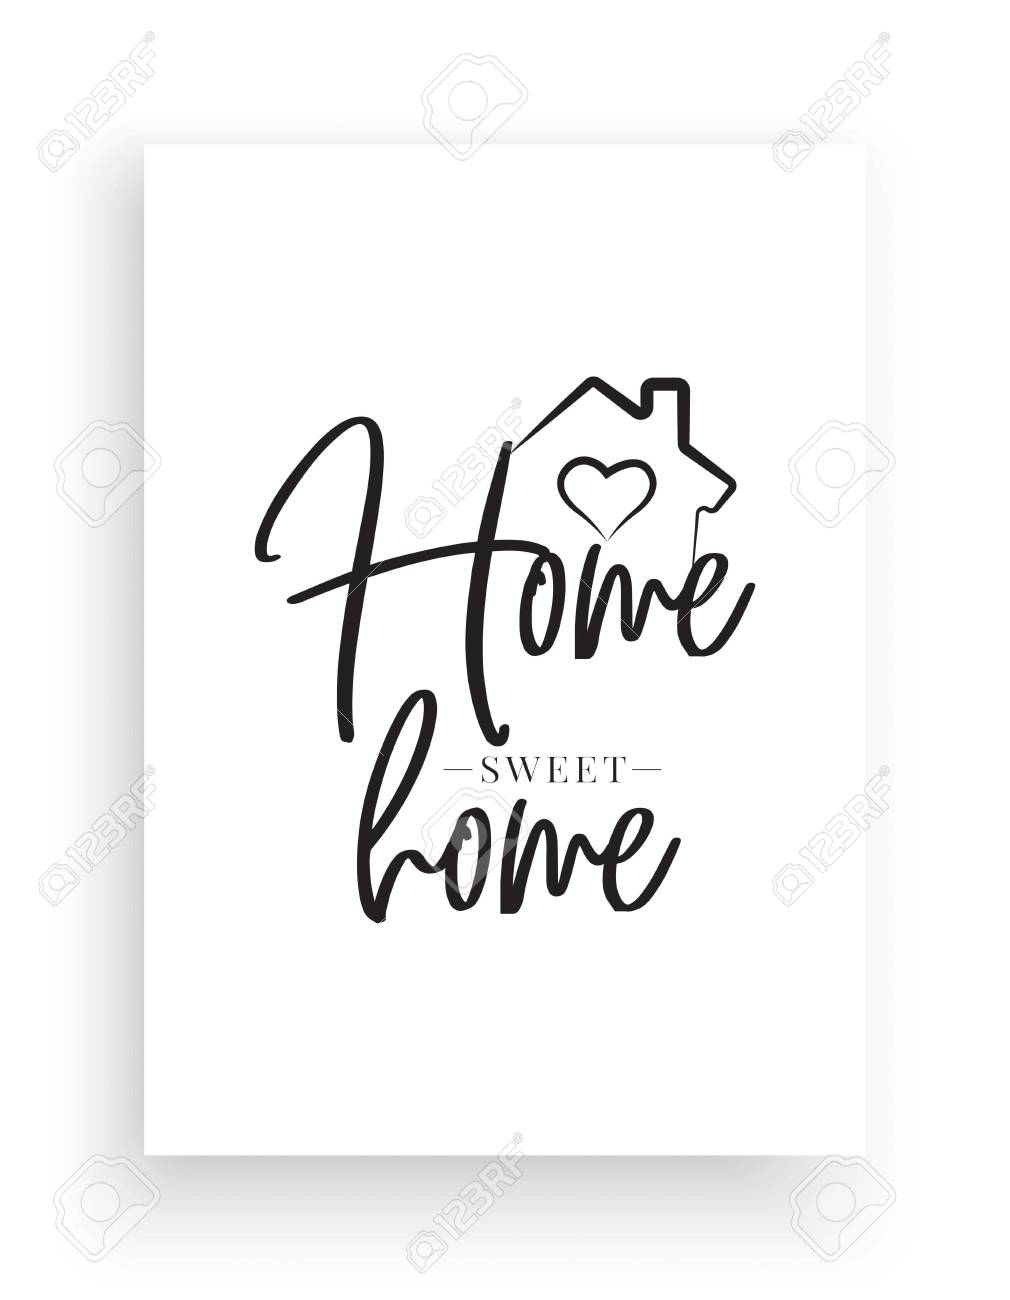 Home Sweet Home Wall Decor.Minimalist Wording Design Home Sweet Home Wall Decor Wall